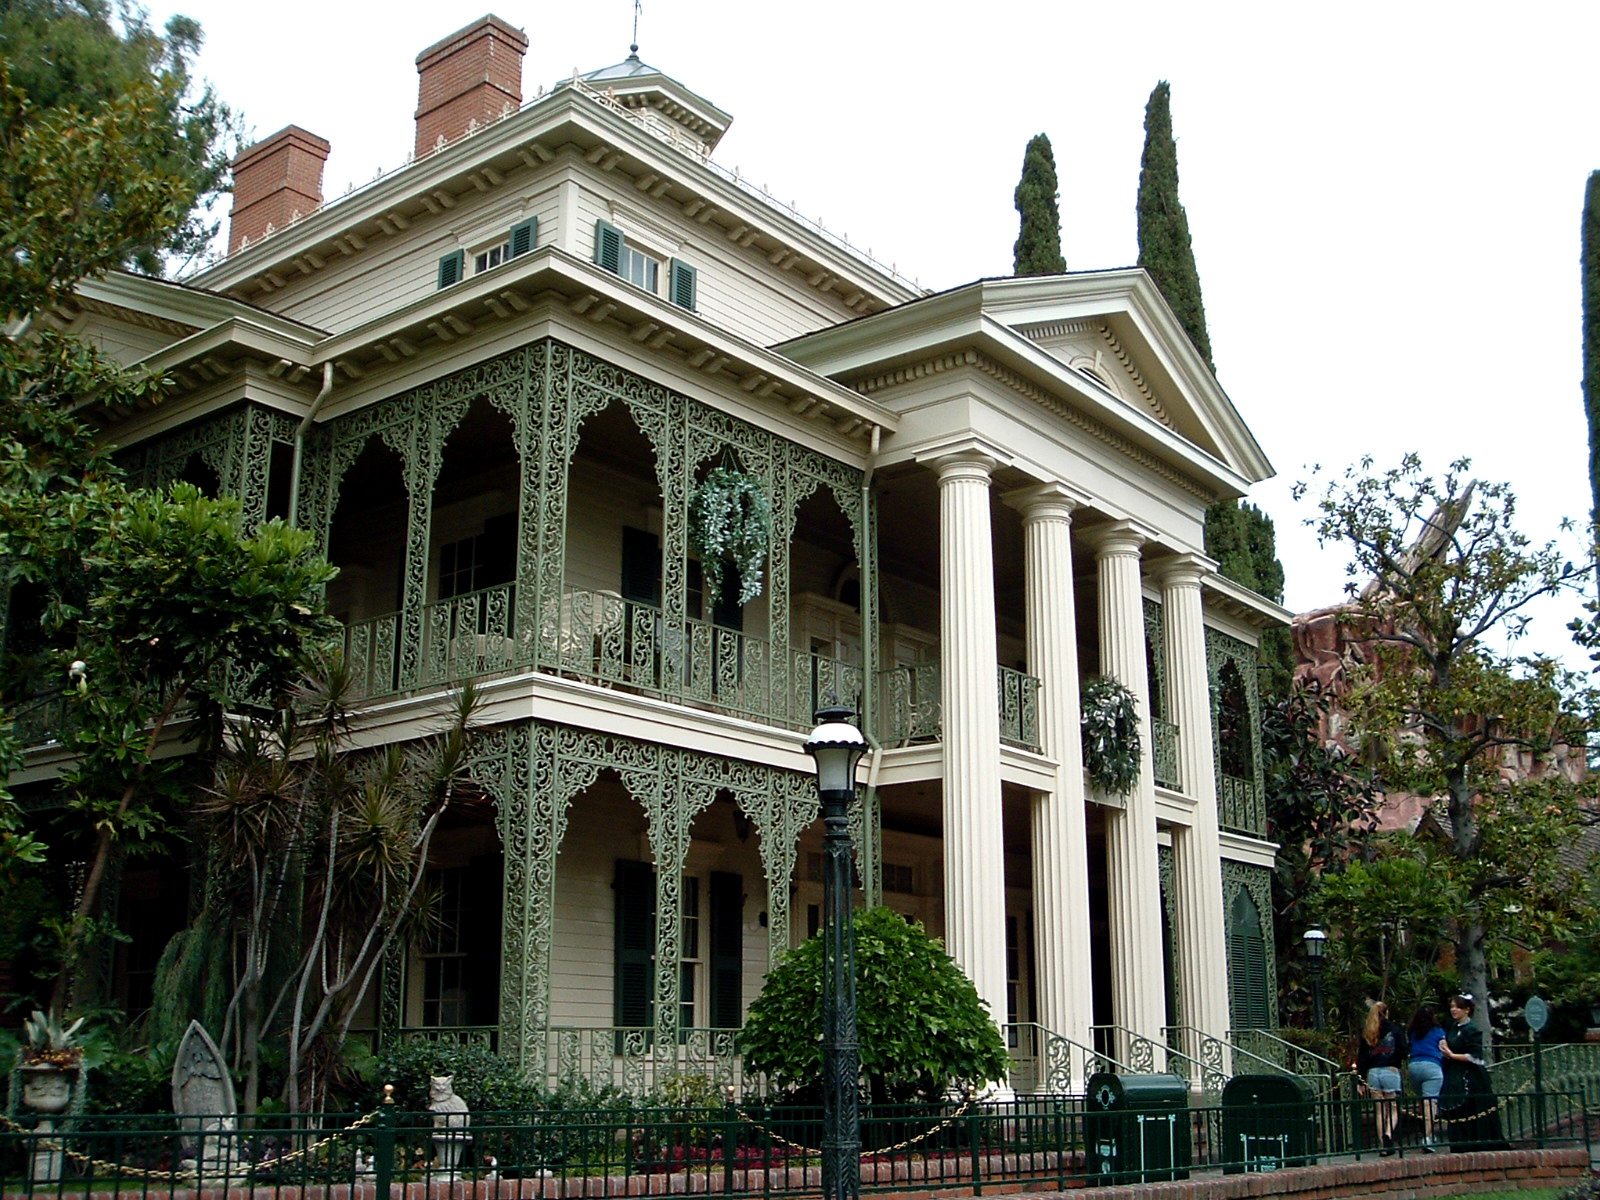 [Dineyland Haunted Mansion]